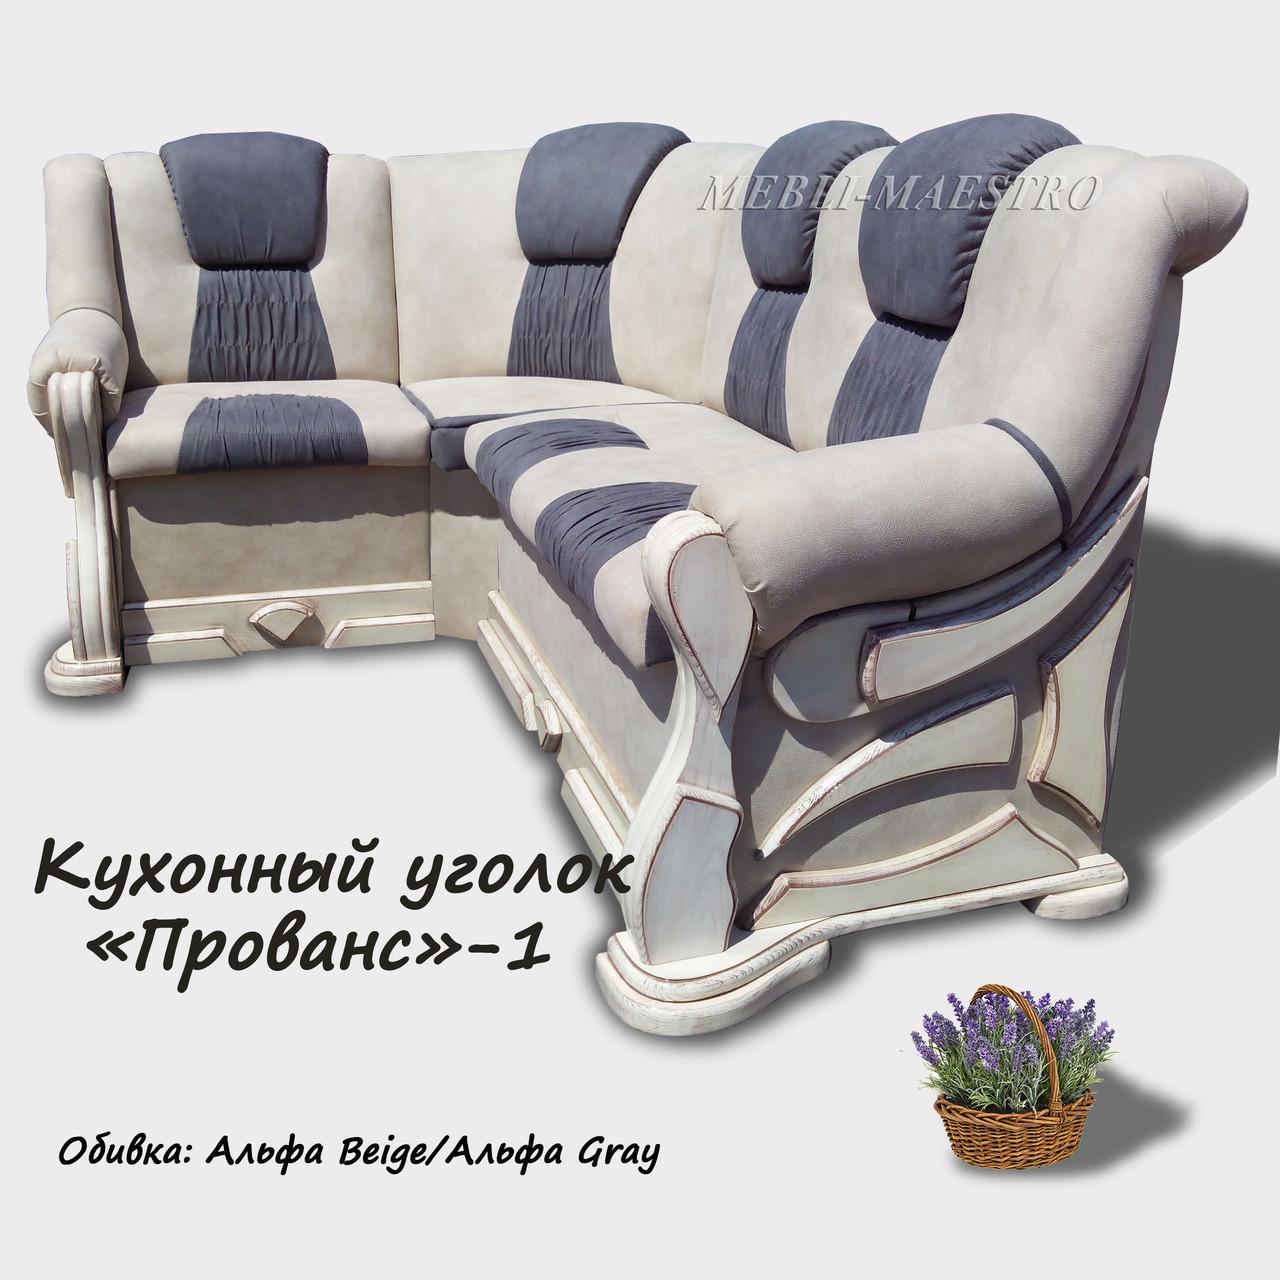 "Мягкий кухонный уголок ""Прованс""-1"